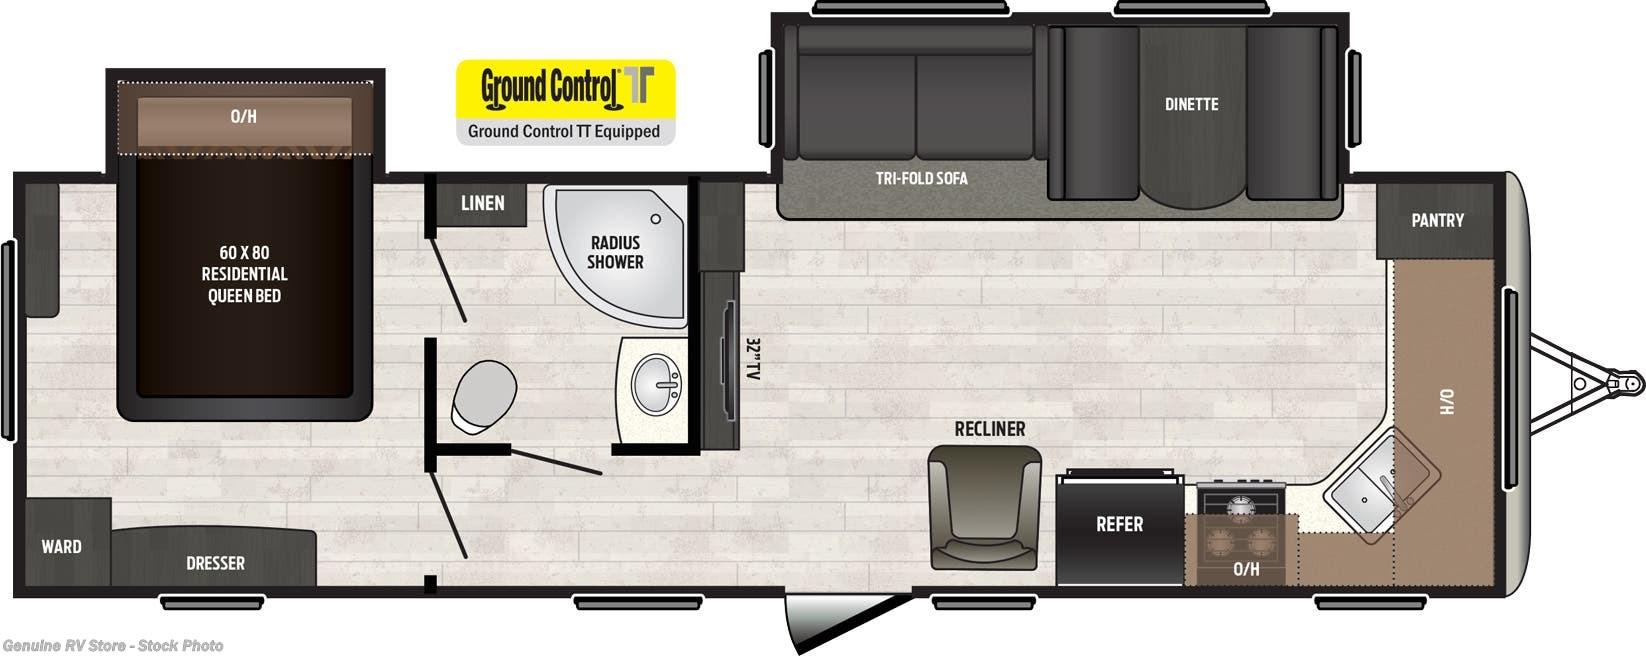 2017 Keystone Rv Sprinter Campfire 29fk For Sale In Nacogdoches Tx Monitor Panel Wiring Diagram Previous